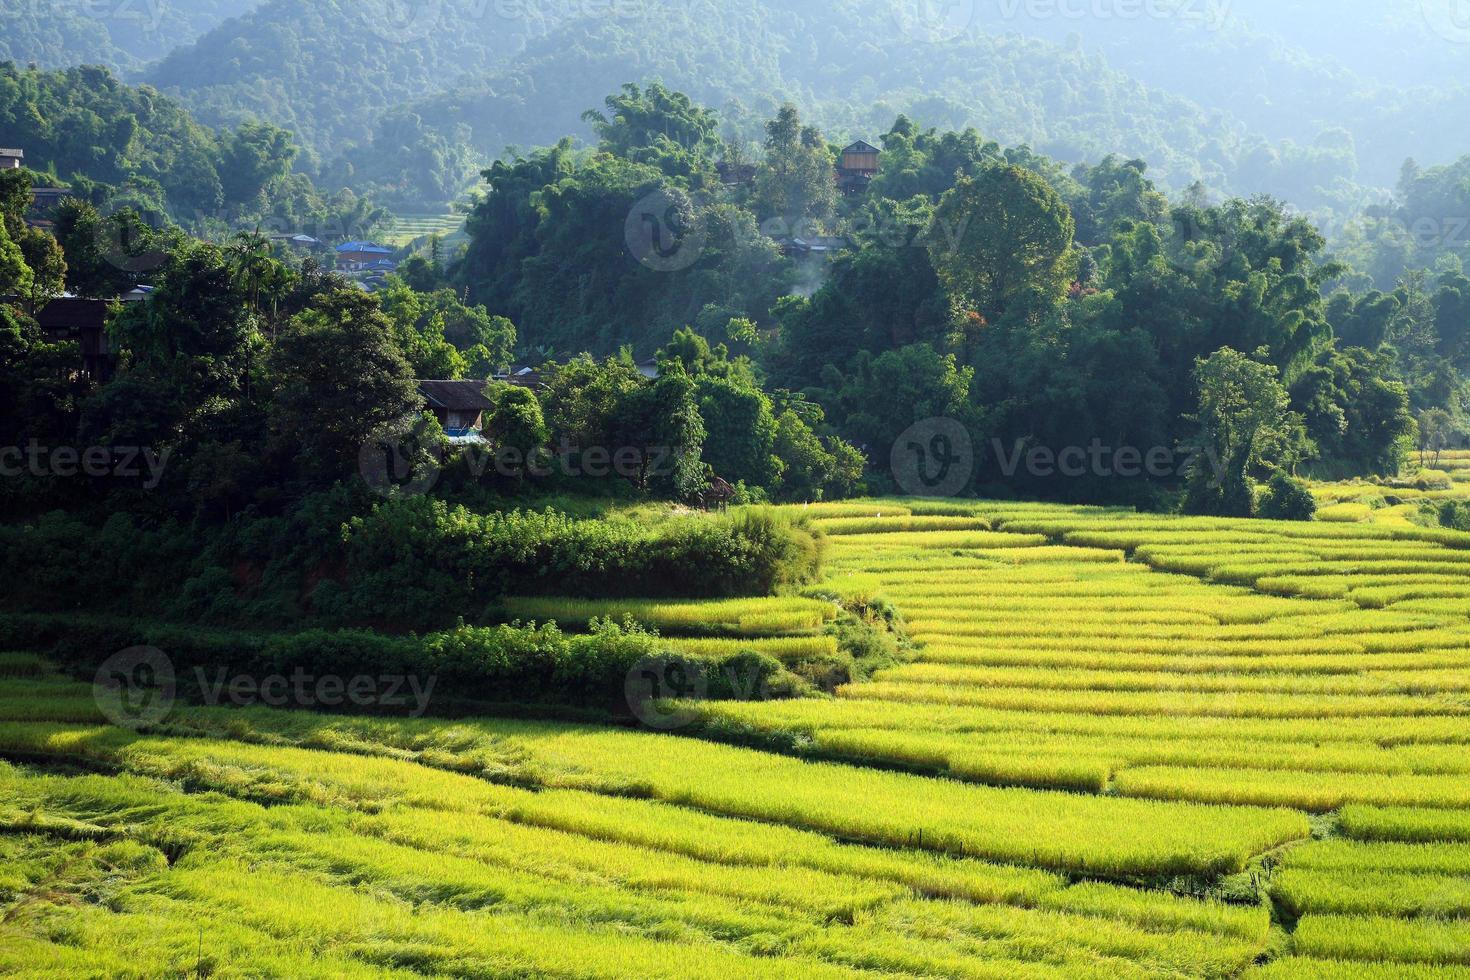 risaia a terrazze in campagna, Chiang Mai, Tailandia foto